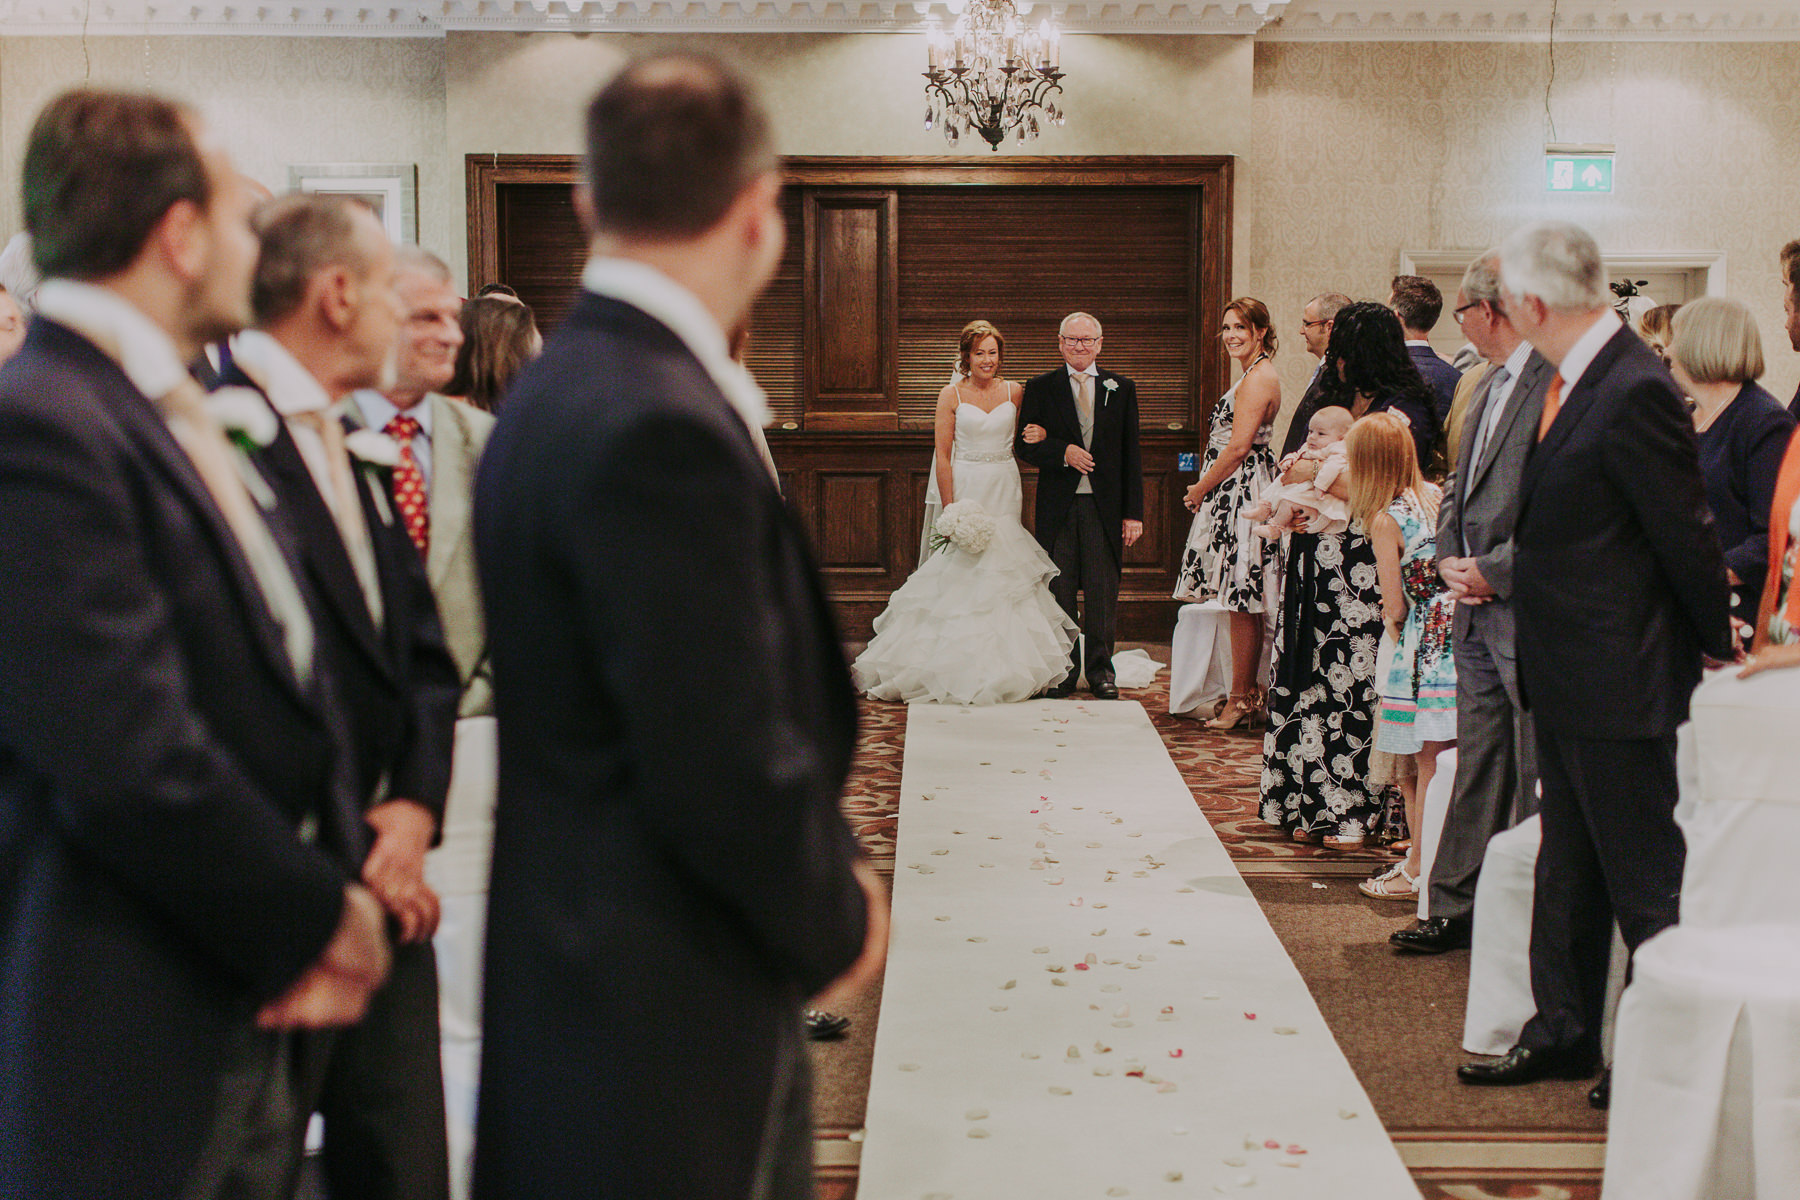 Meg & Jon | Wood Hall Hotel Wedding 319